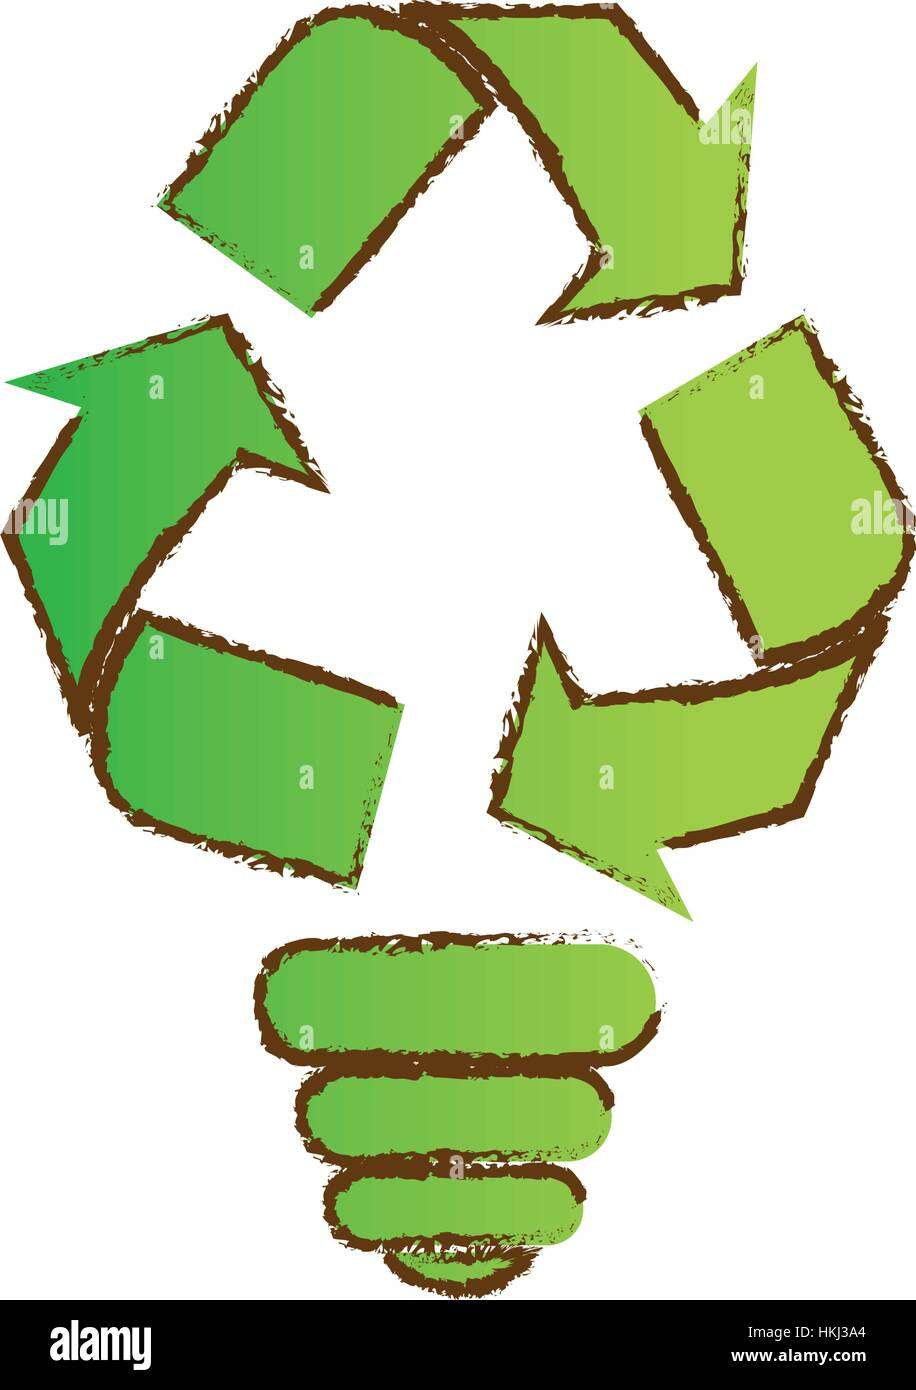 Color bulb environmental care icon image, vector illustration - Stock Image